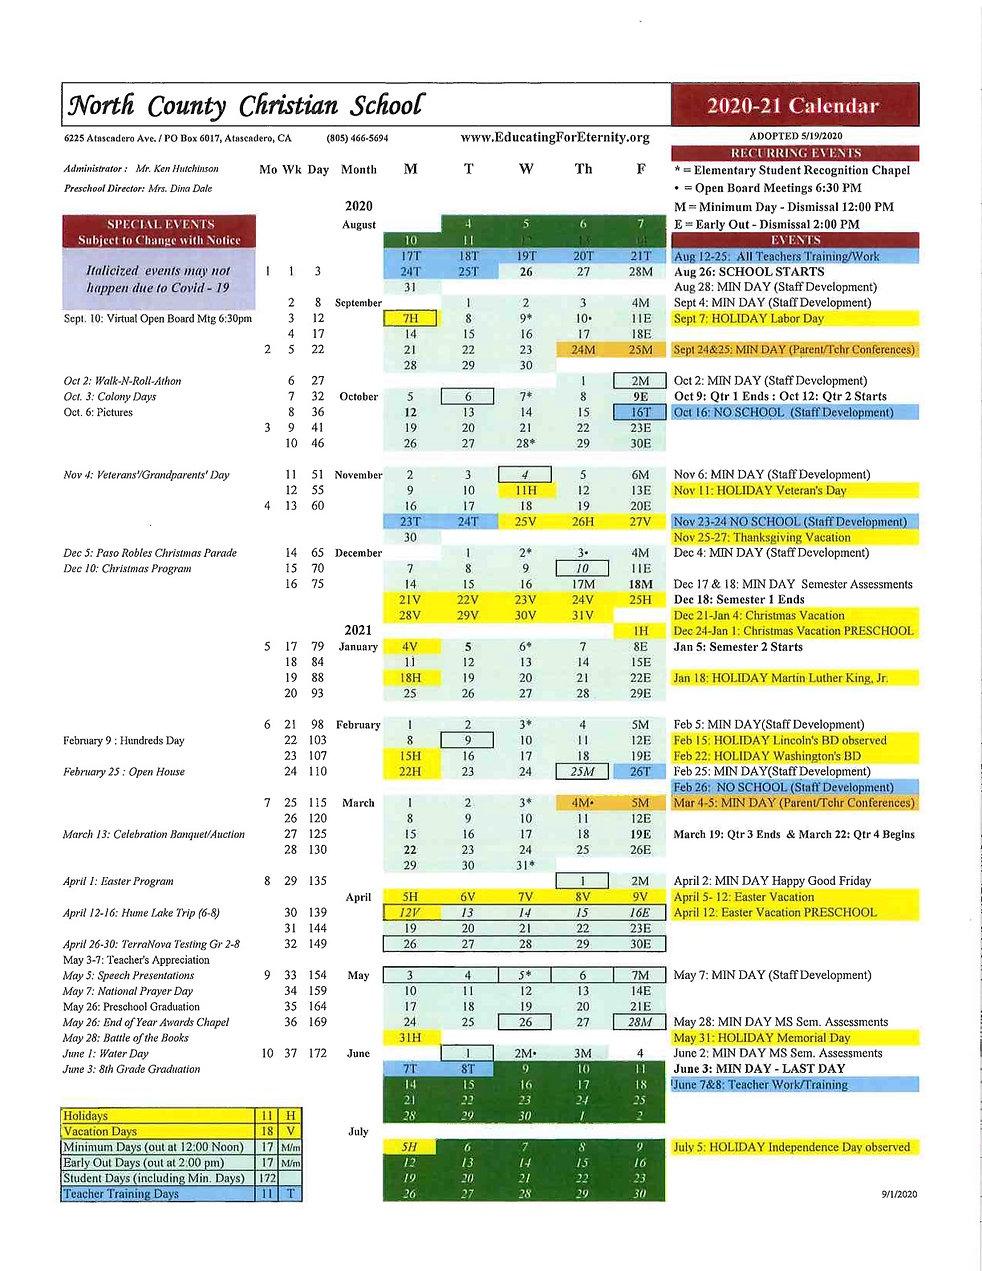 ncc_calendar_20-21.jpg